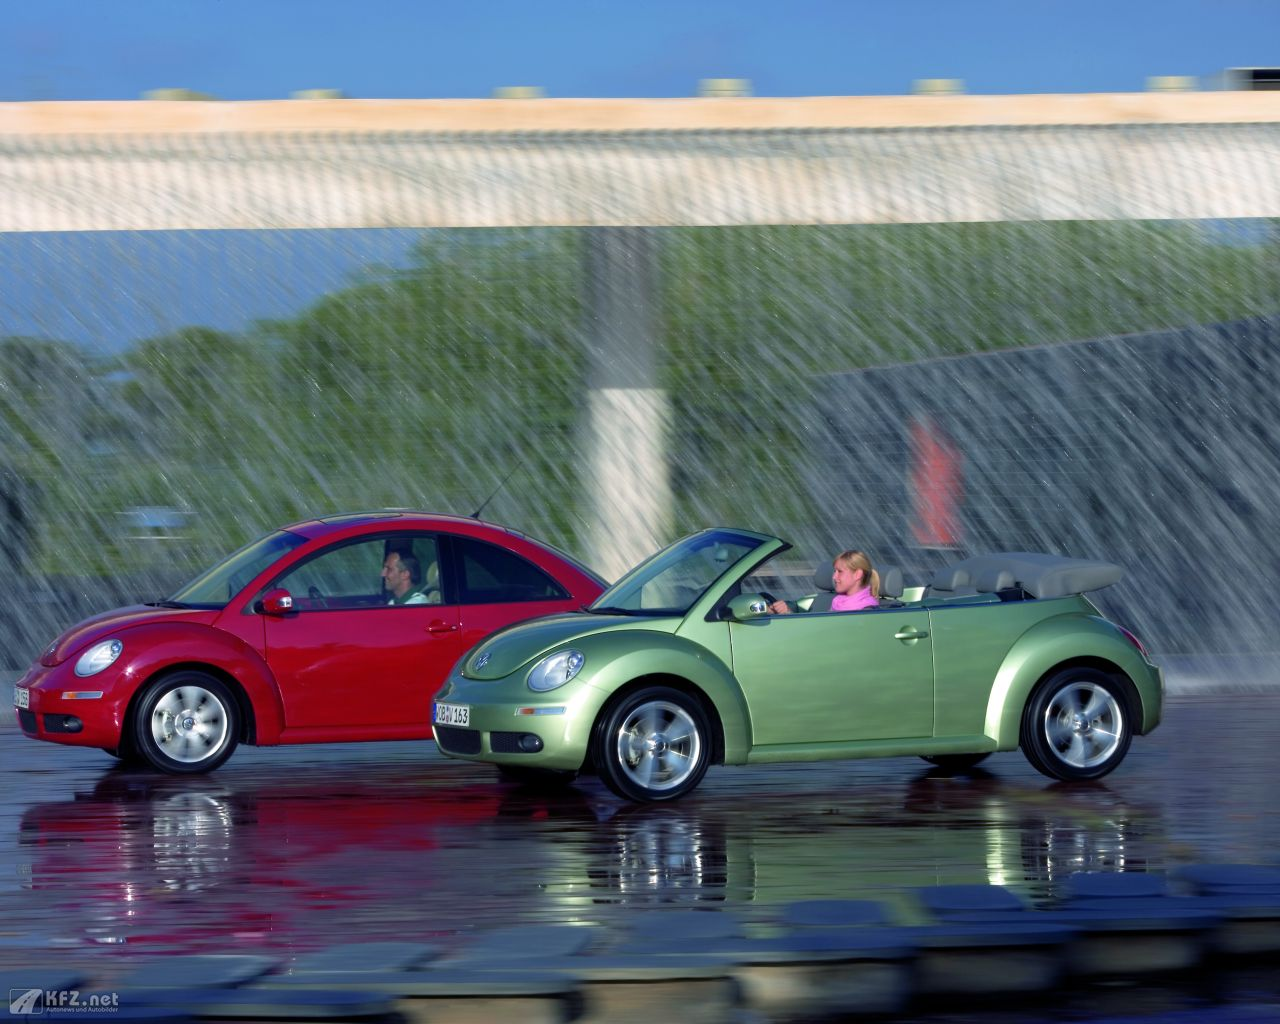 vw-beetle-1280x1024-10